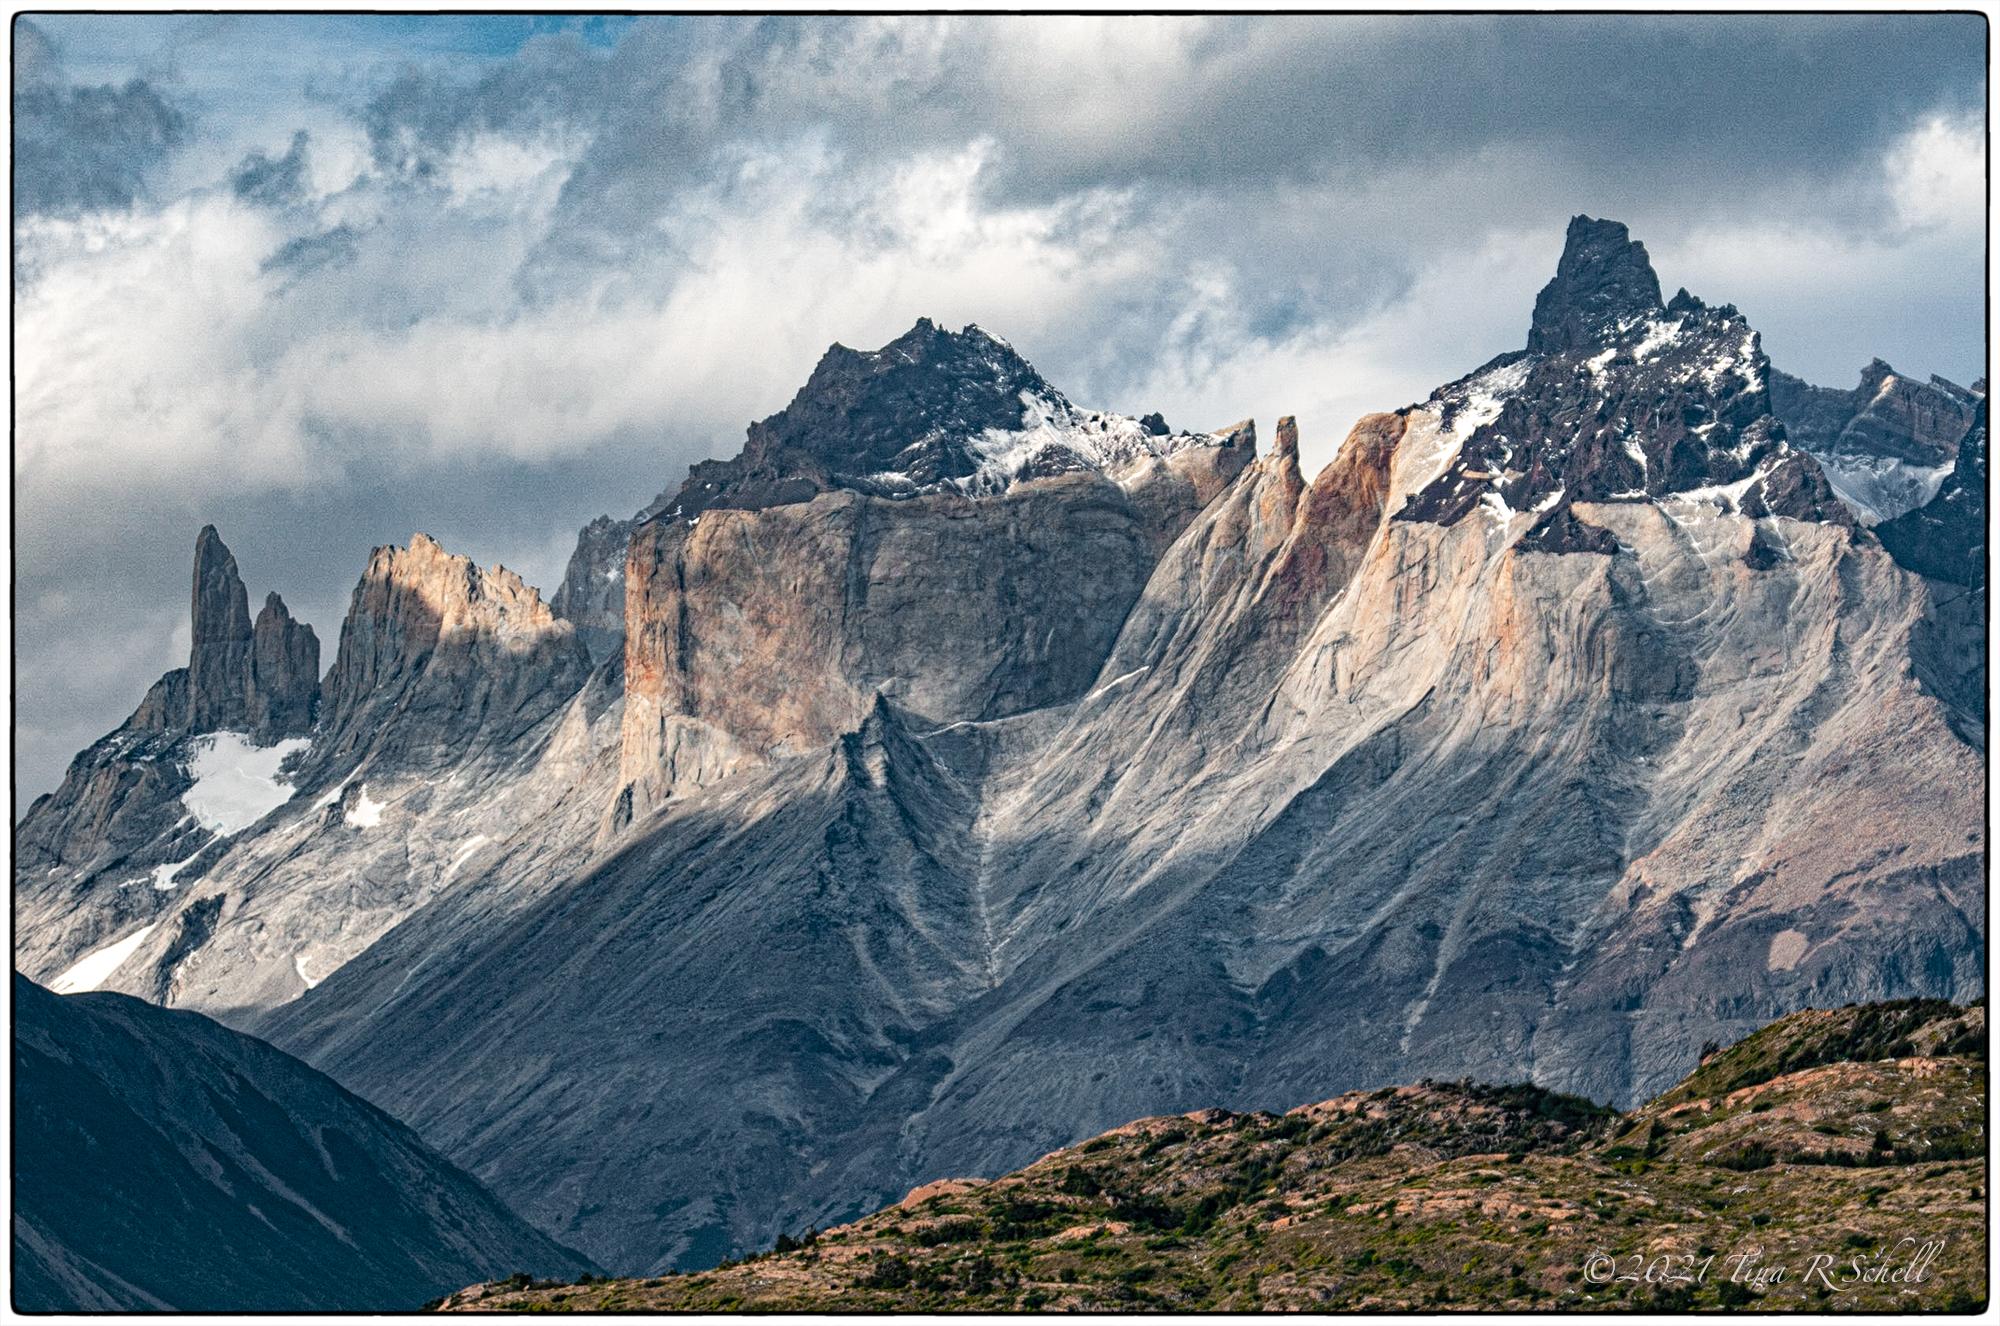 patagonia, mountains, Torres del Paine